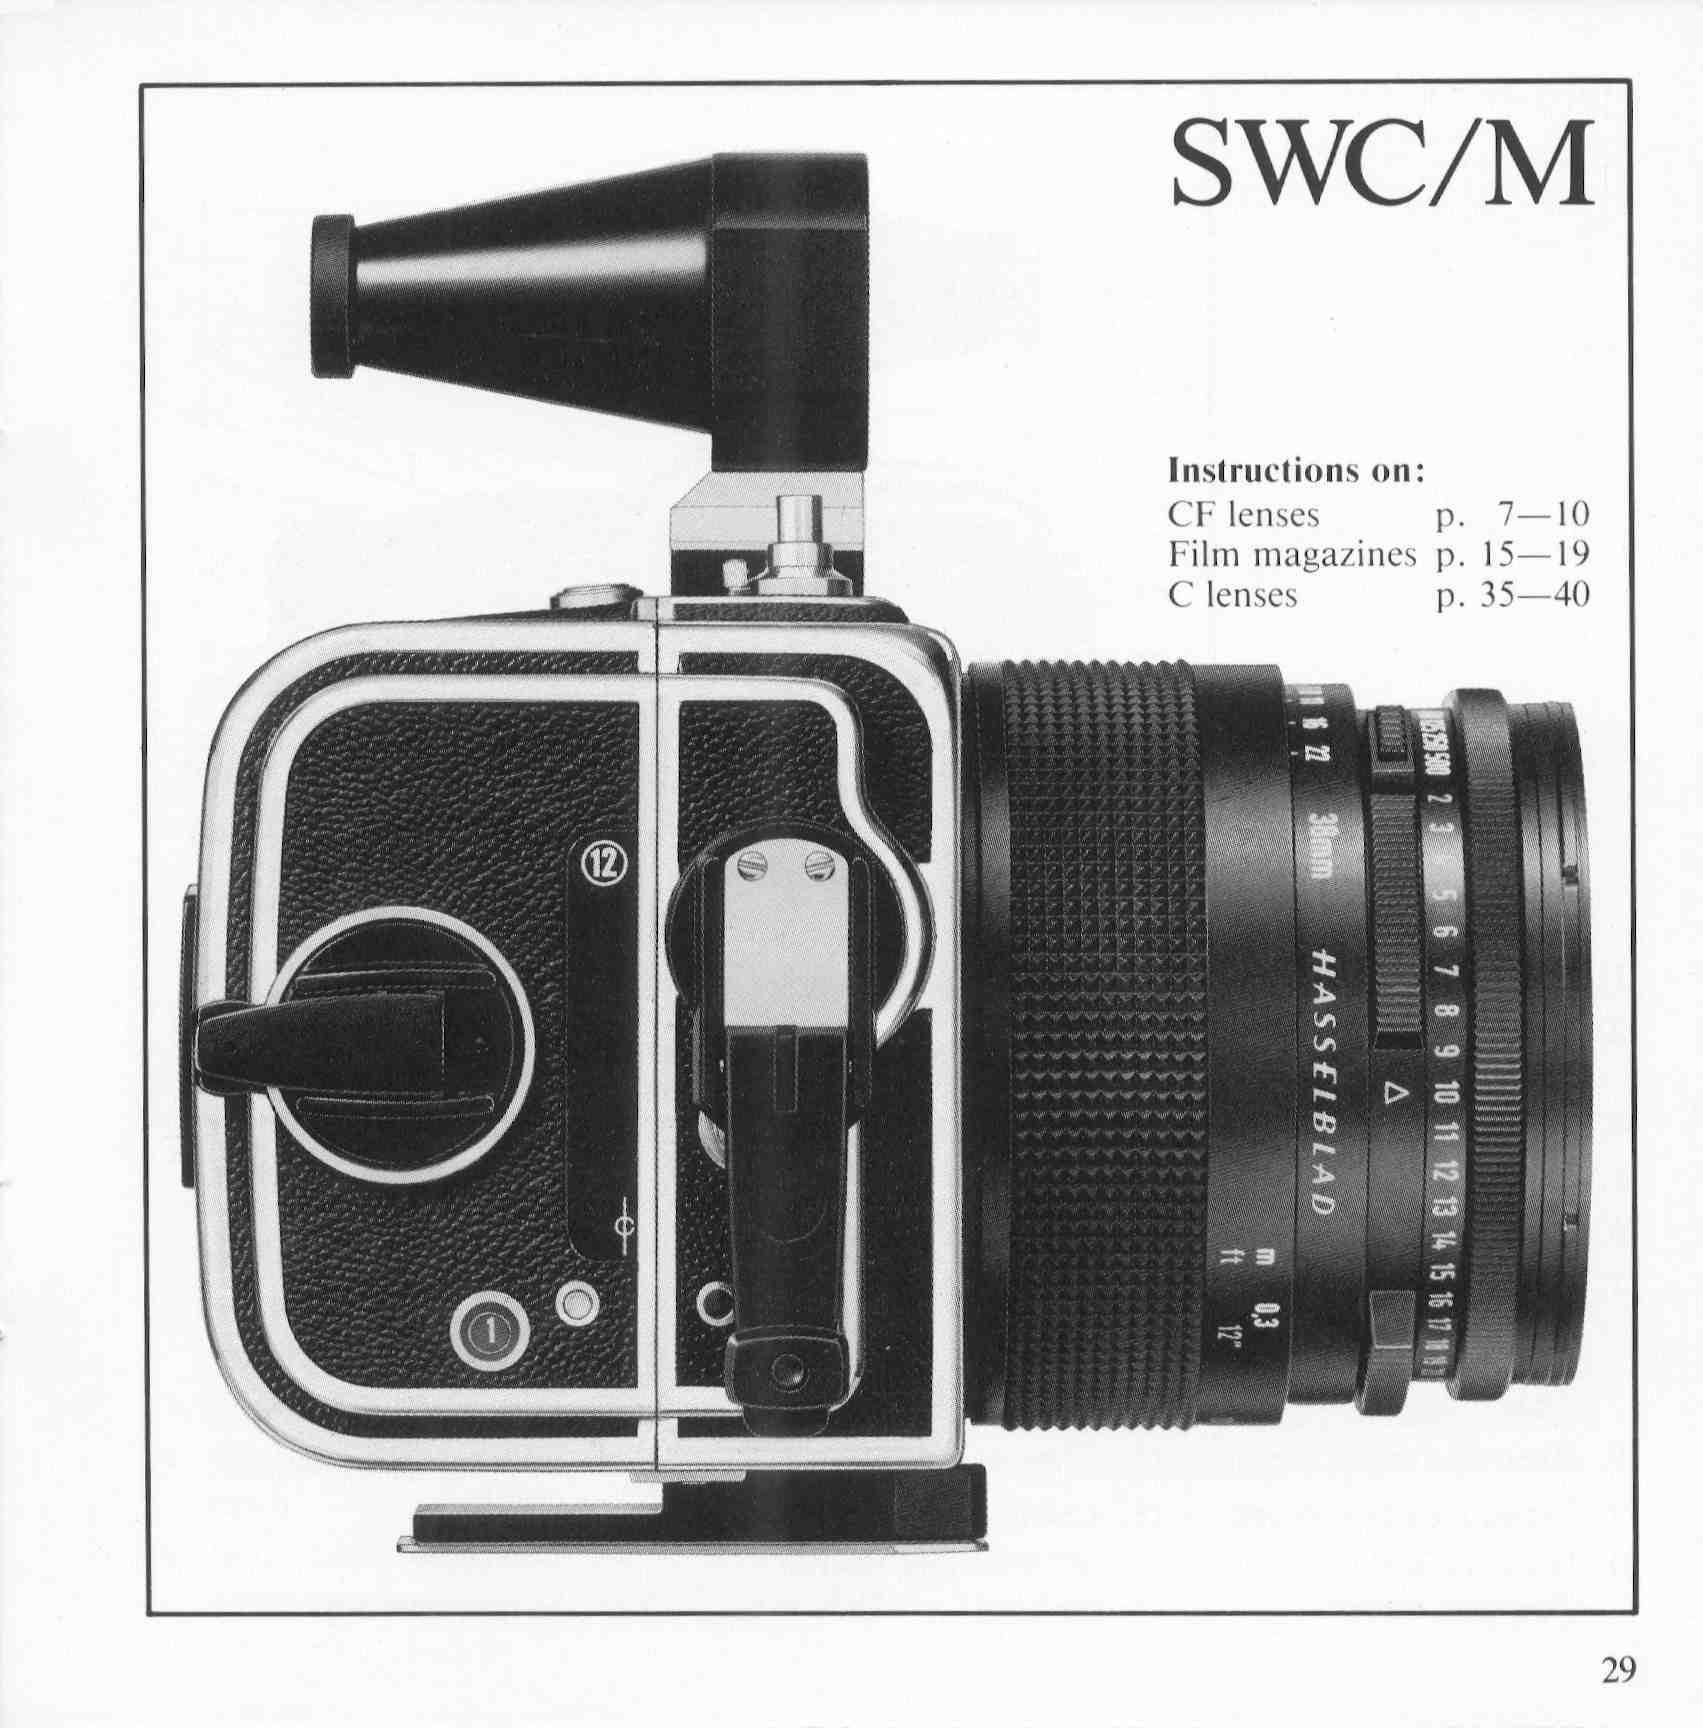 Hasselblad 500C/M, 500 EL/M, SWC/M Instruction Manual